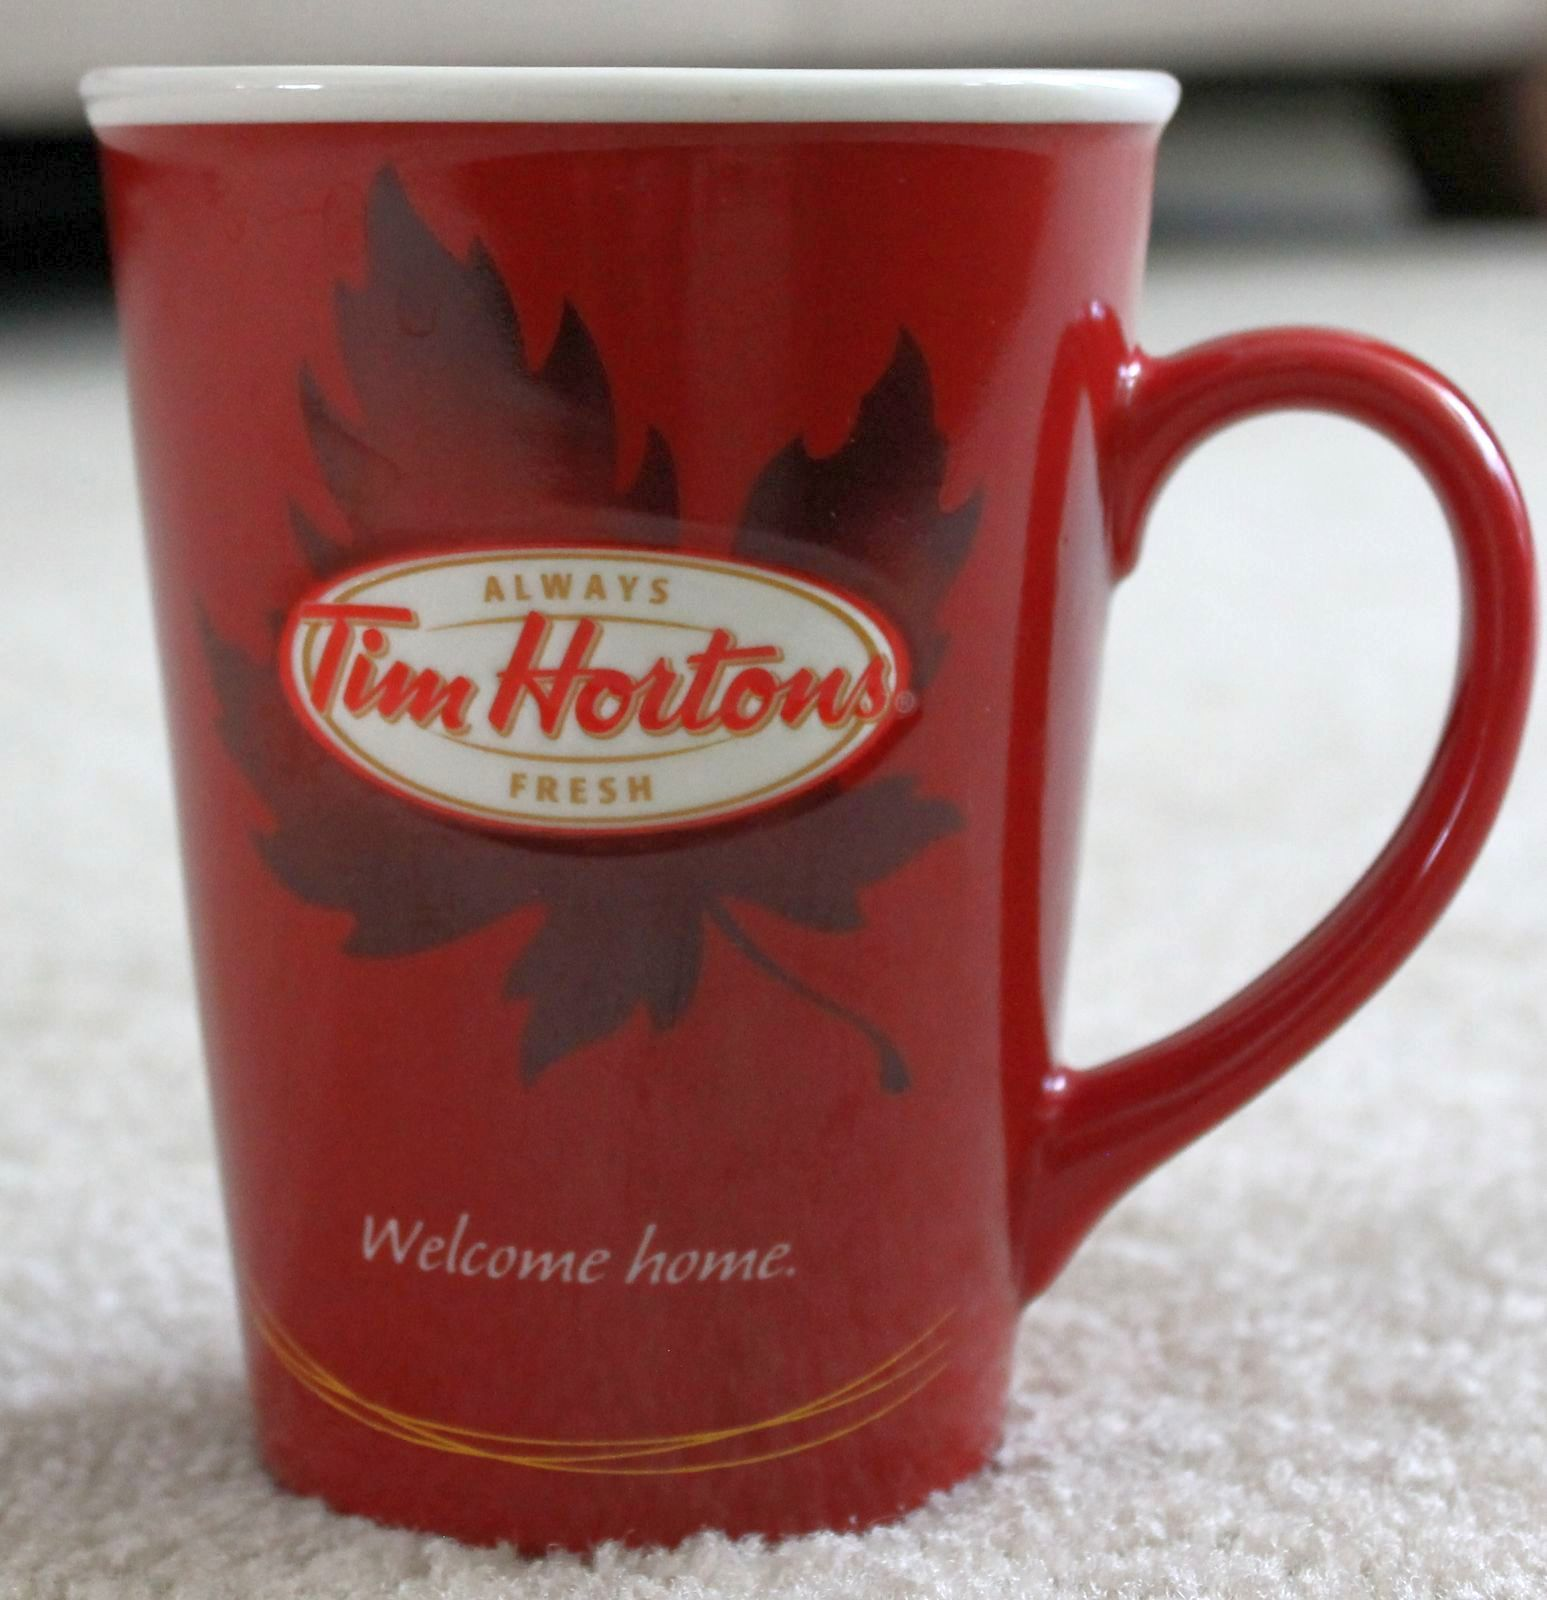 2011 Tim Hortons Horton's 011 Coffee Tea Home